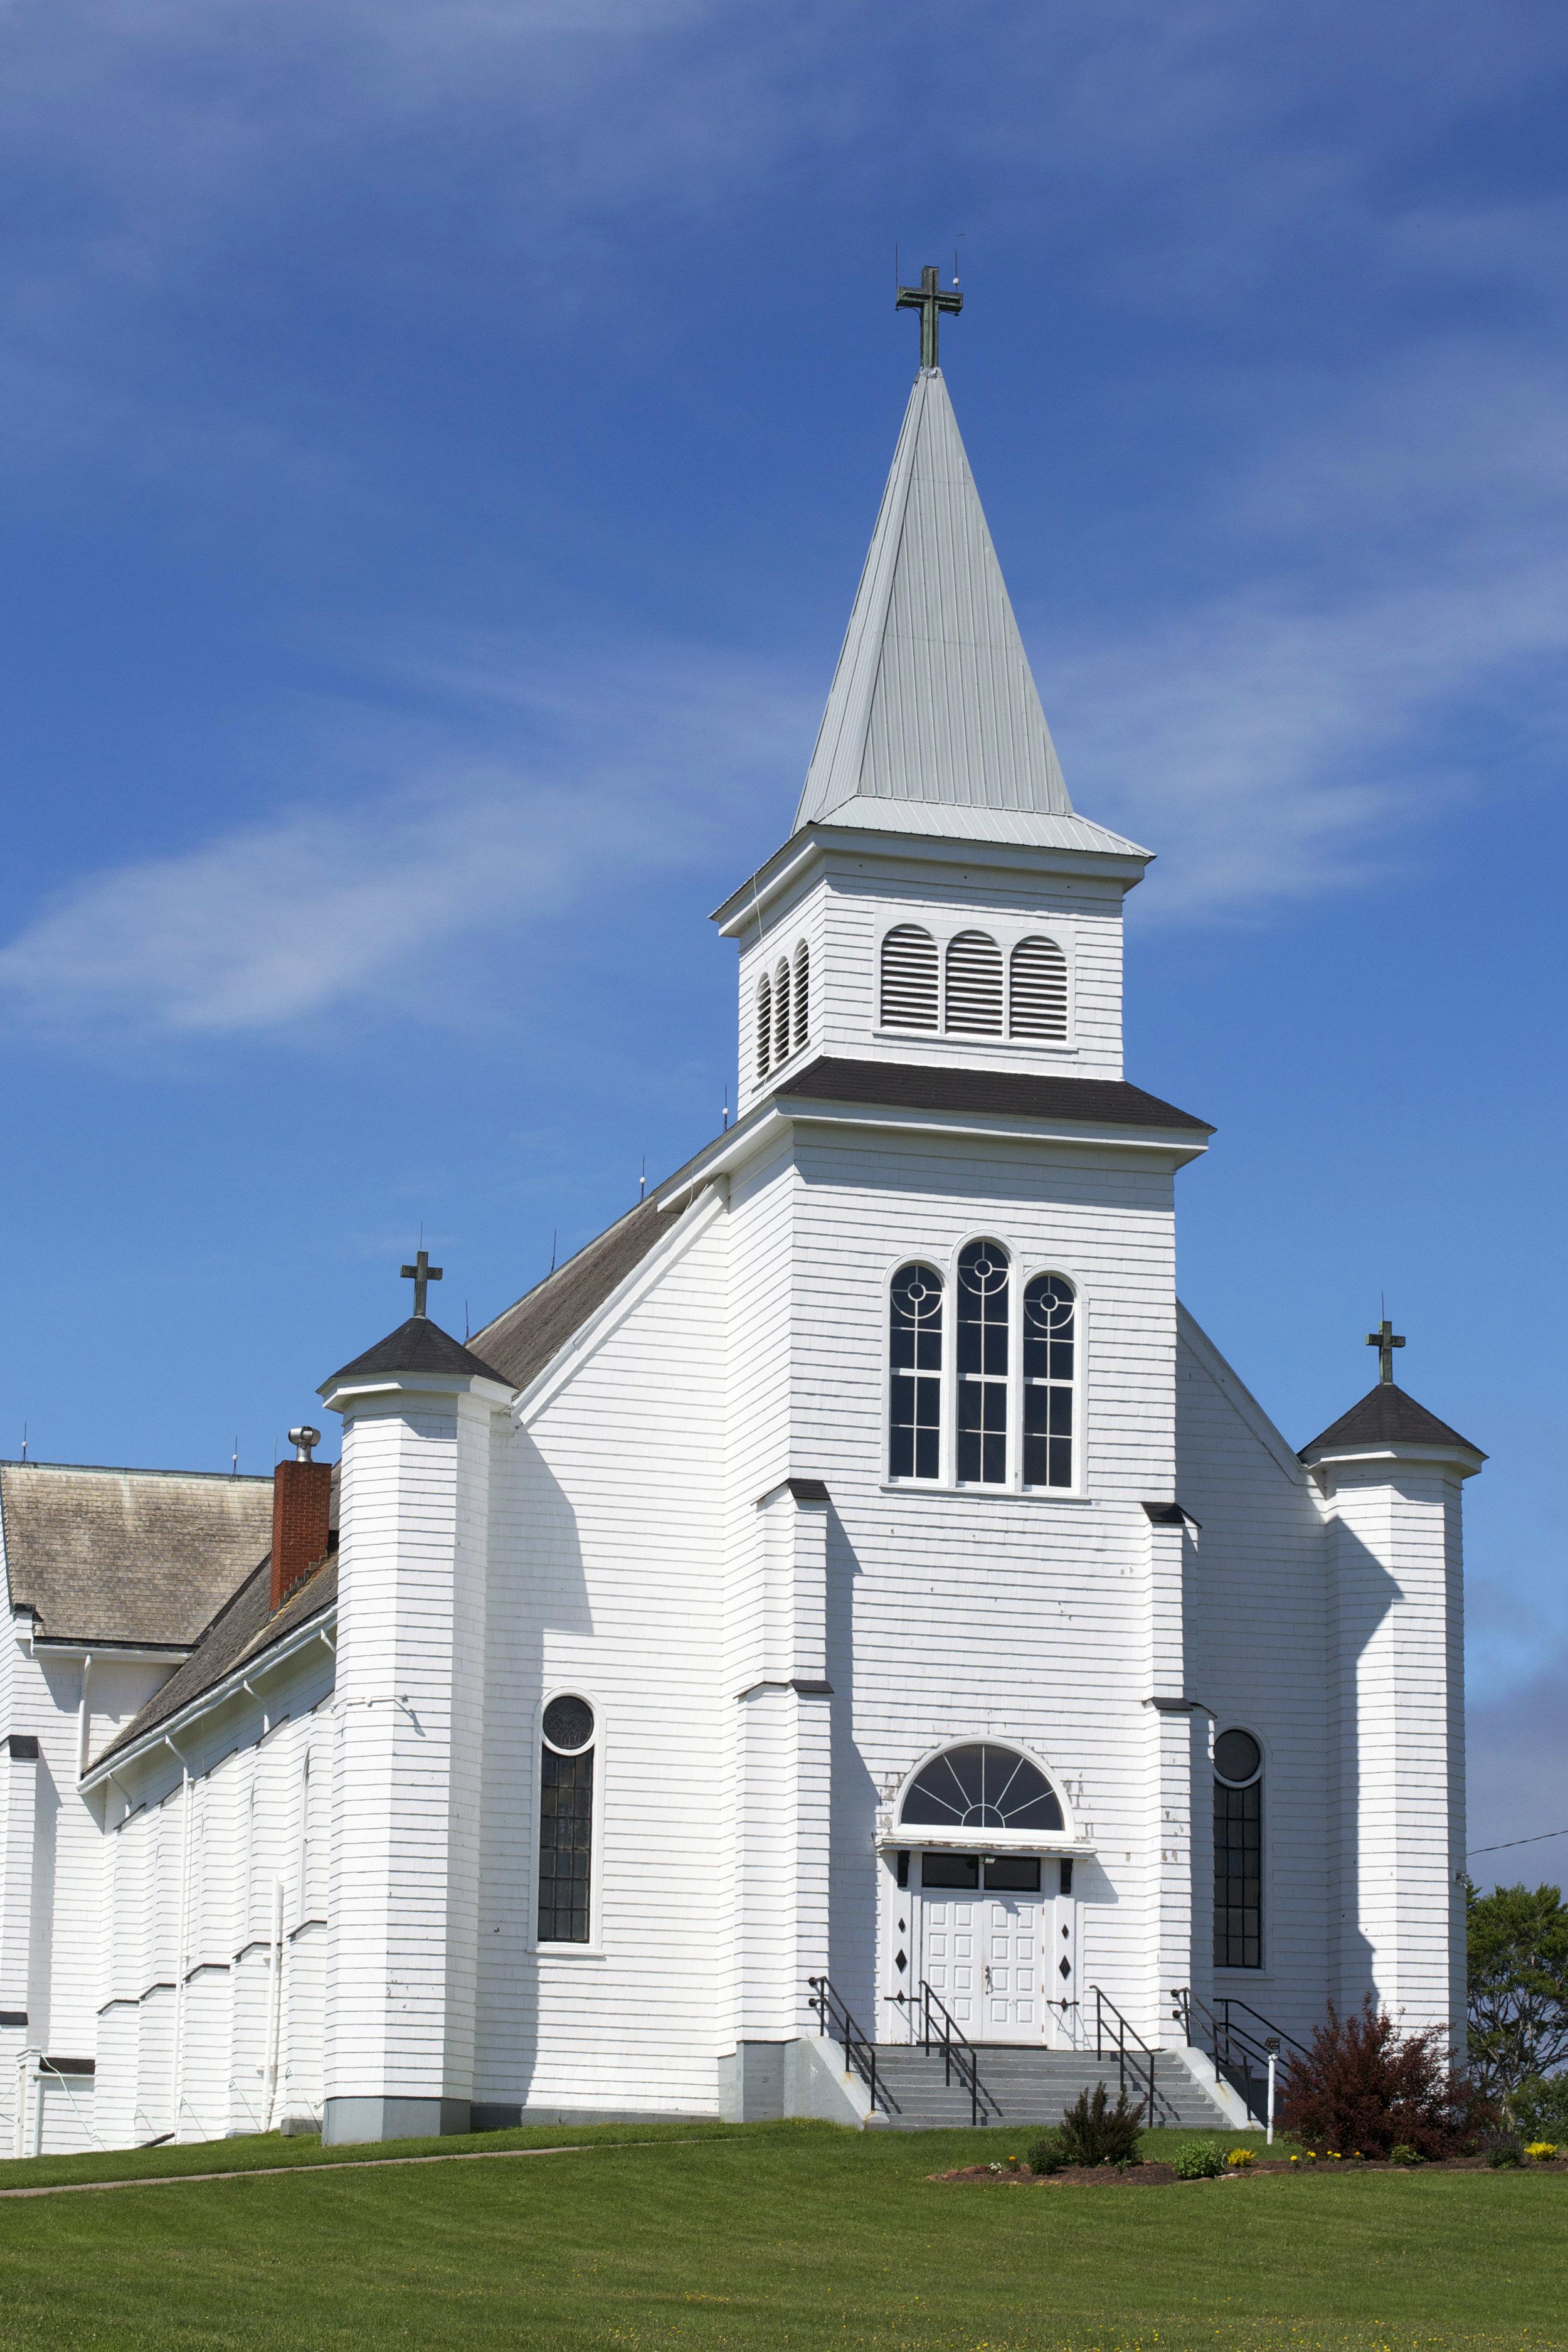 st-peters-massive-church.jpg